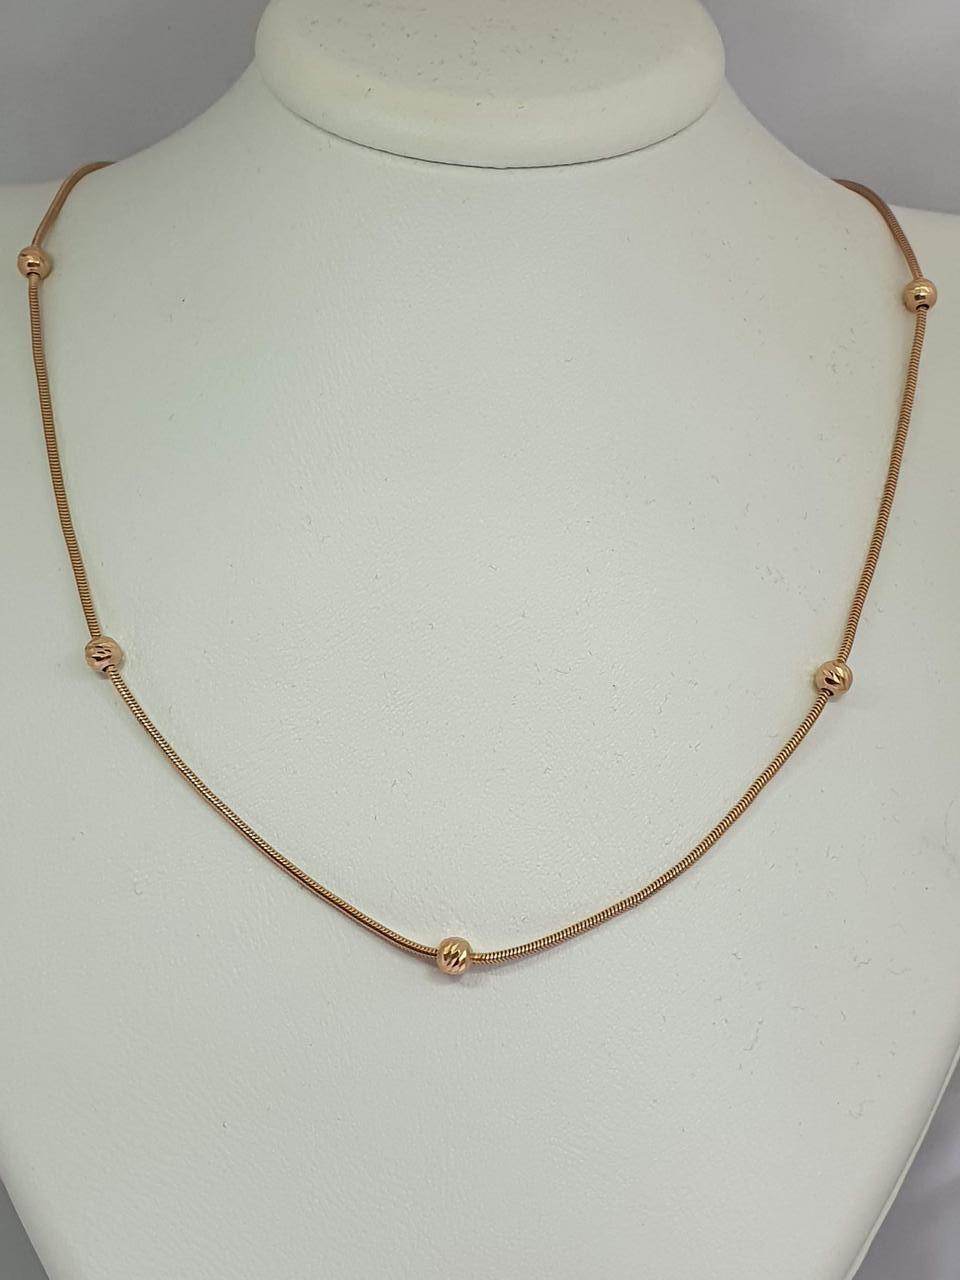 Золотая цепочка (Снейк с бусинами). Артикул ЦП305(1)И 50